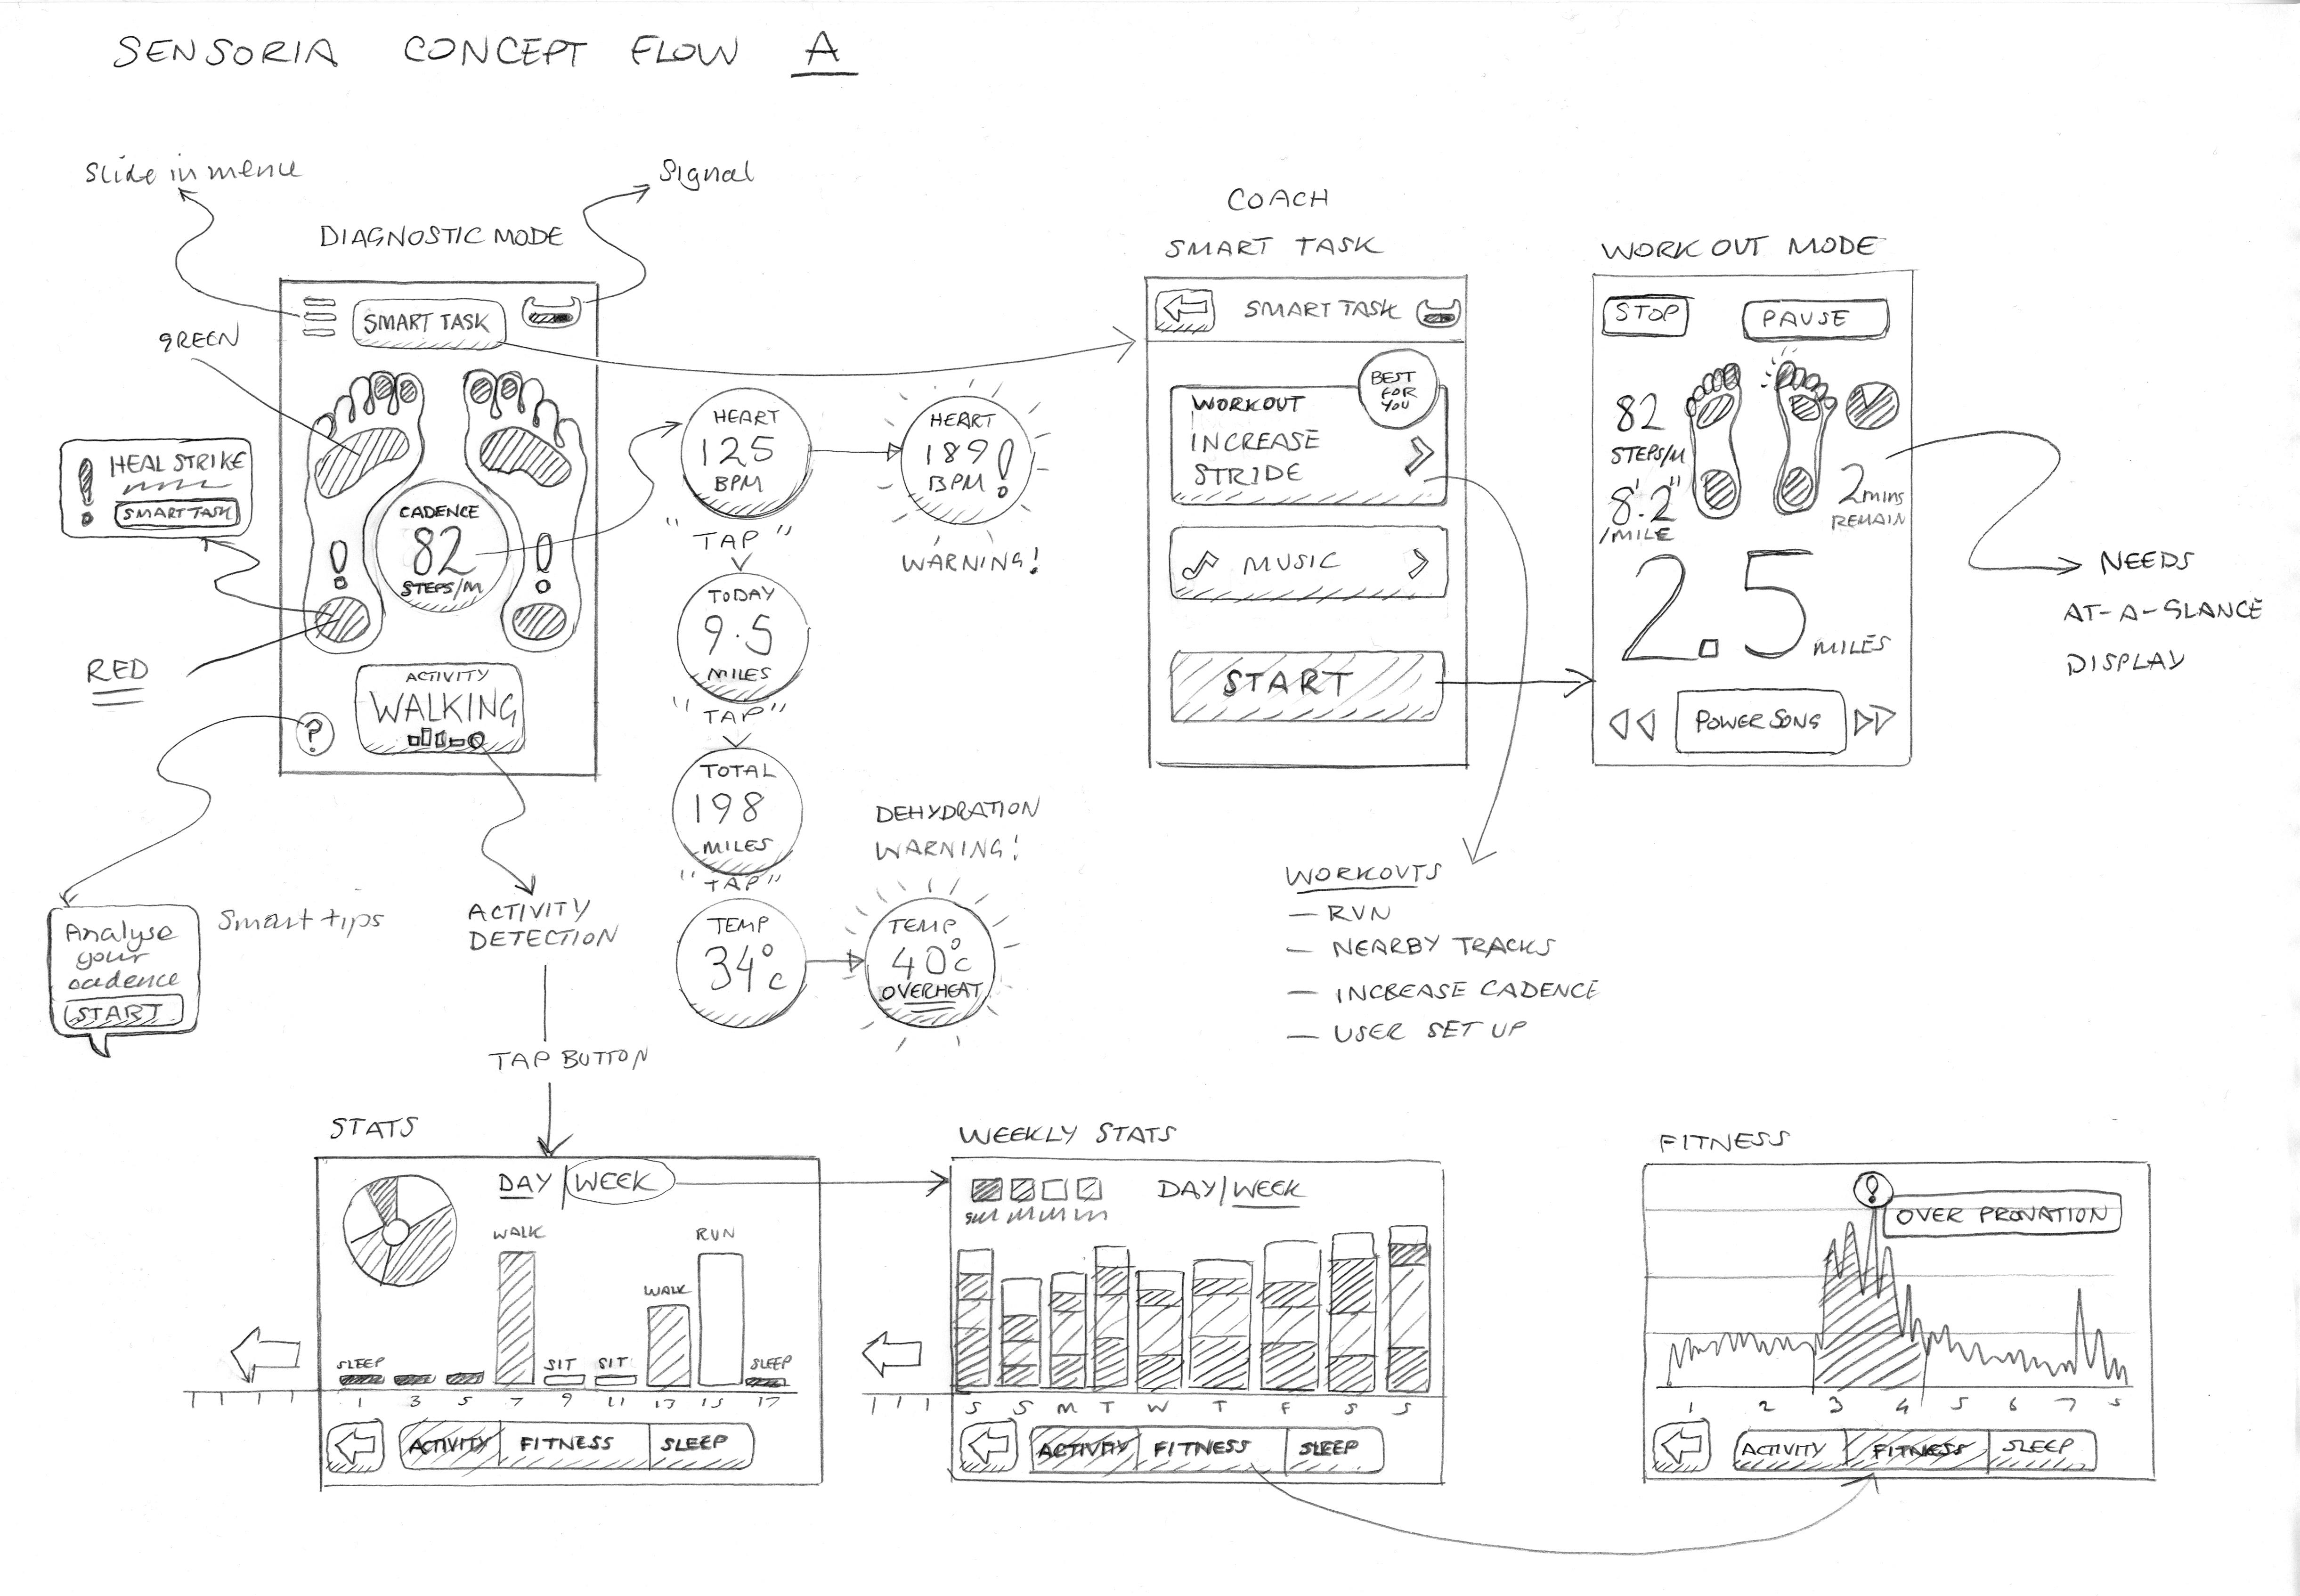 Sensoria fitness iphone app ui design sketches graham todman sensoria wearable tech running iphone app sketches ccuart Image collections